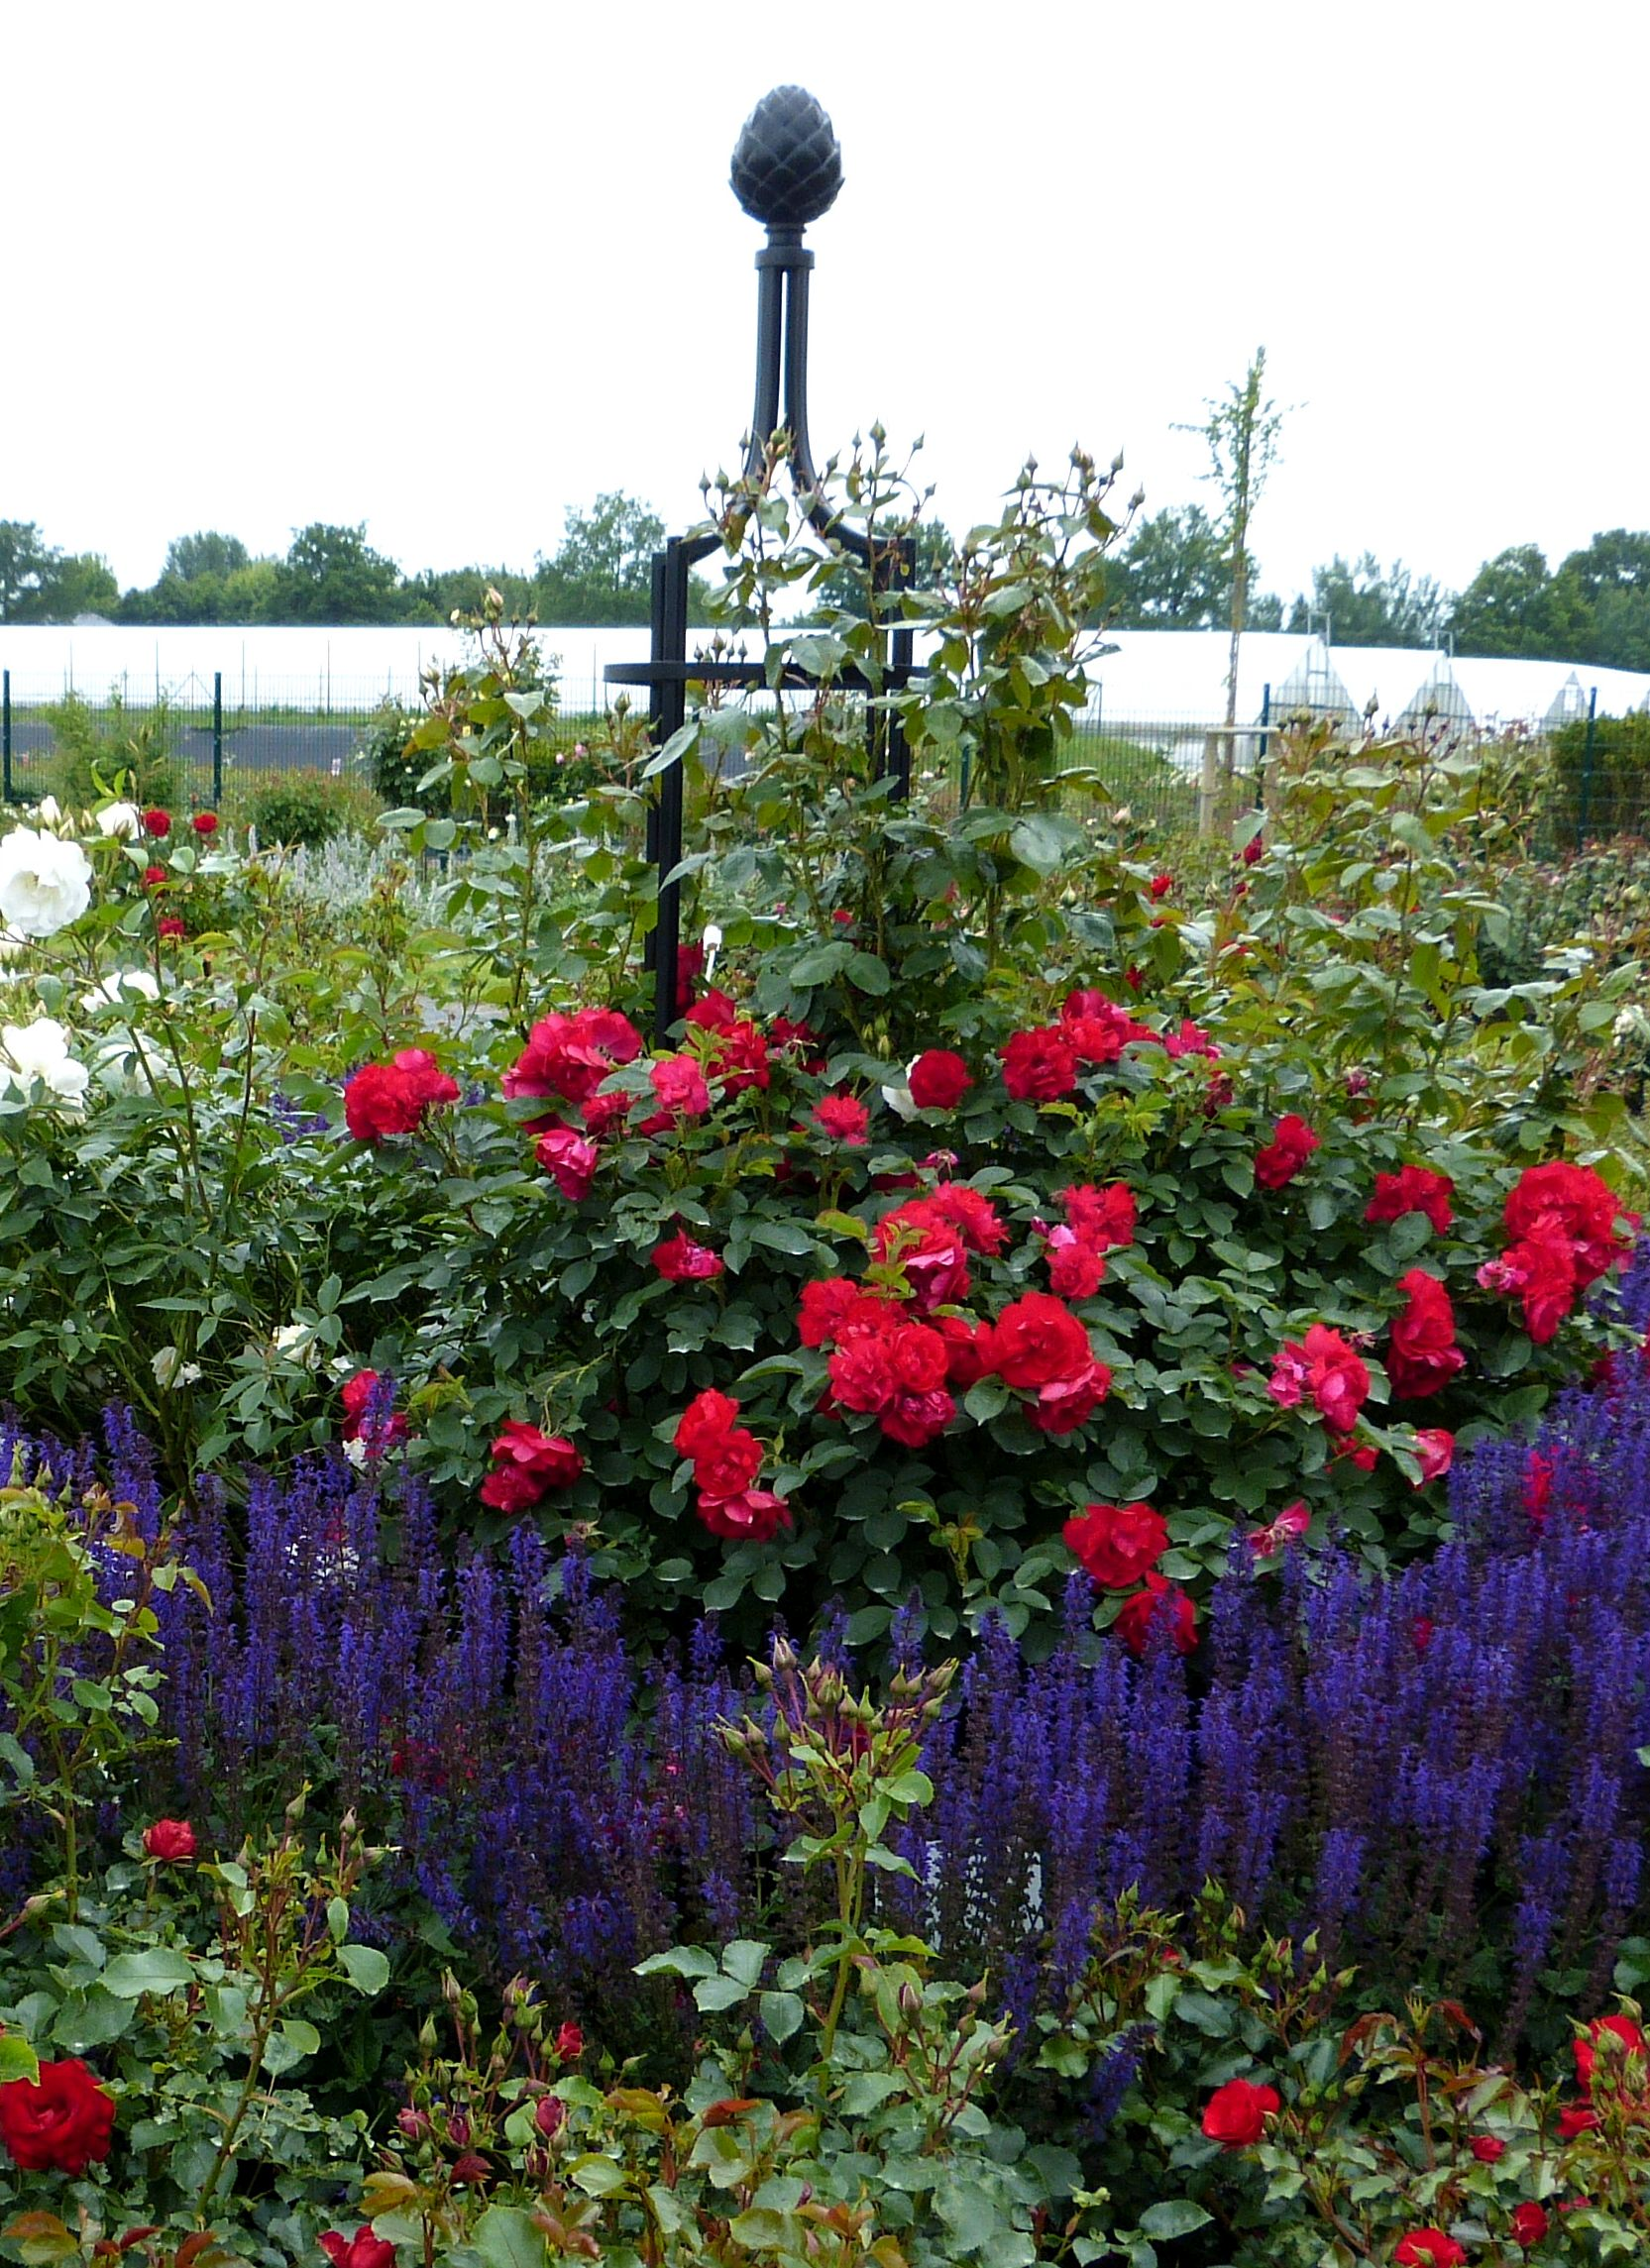 Rankobelisk aus Metall Gartenobelisk I Classic Garden Elements